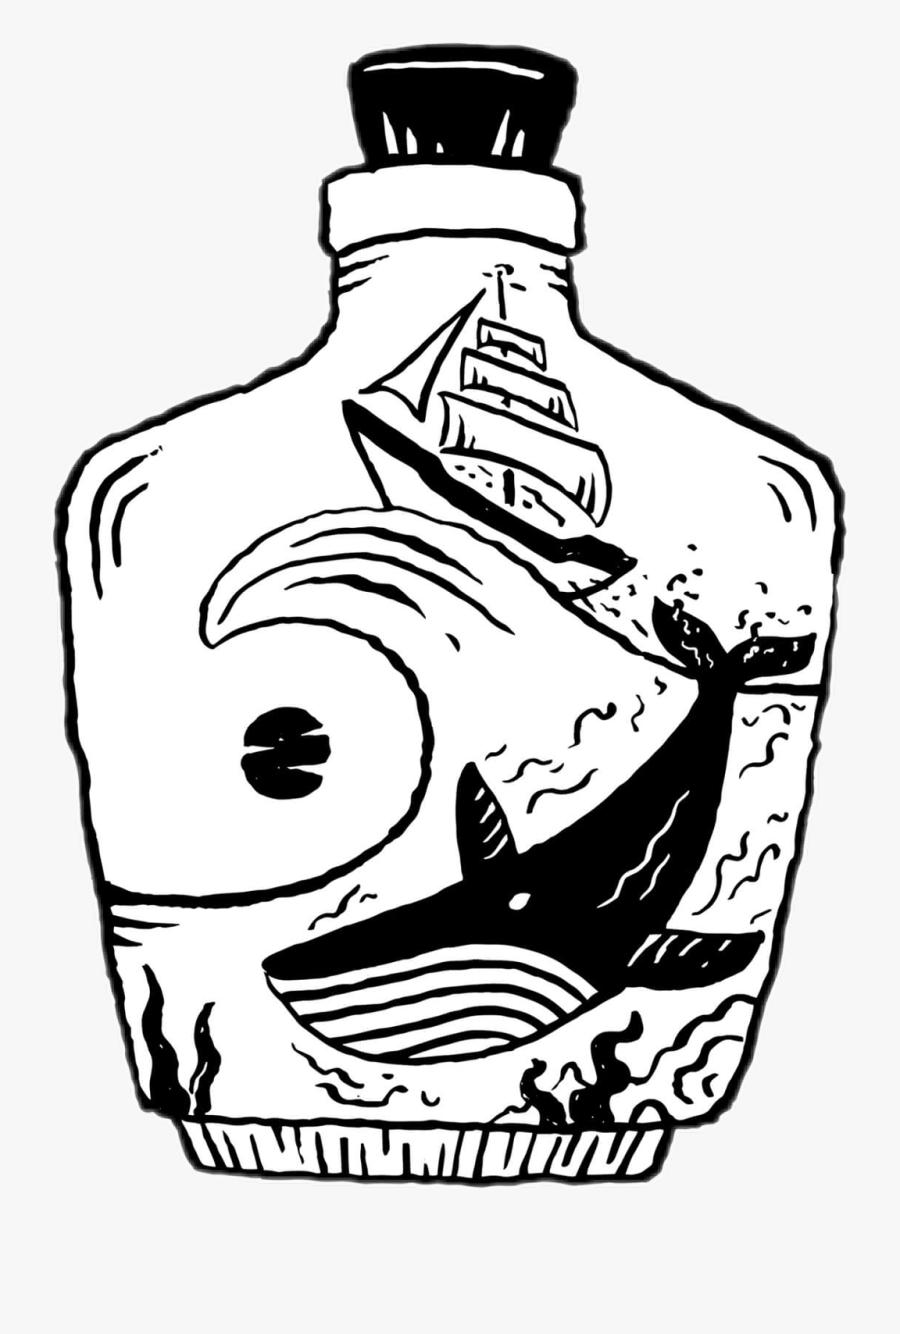 #sticker #bottleart #bottle #whale #sea #ocean #cool - Glass Bottle, Transparent Clipart